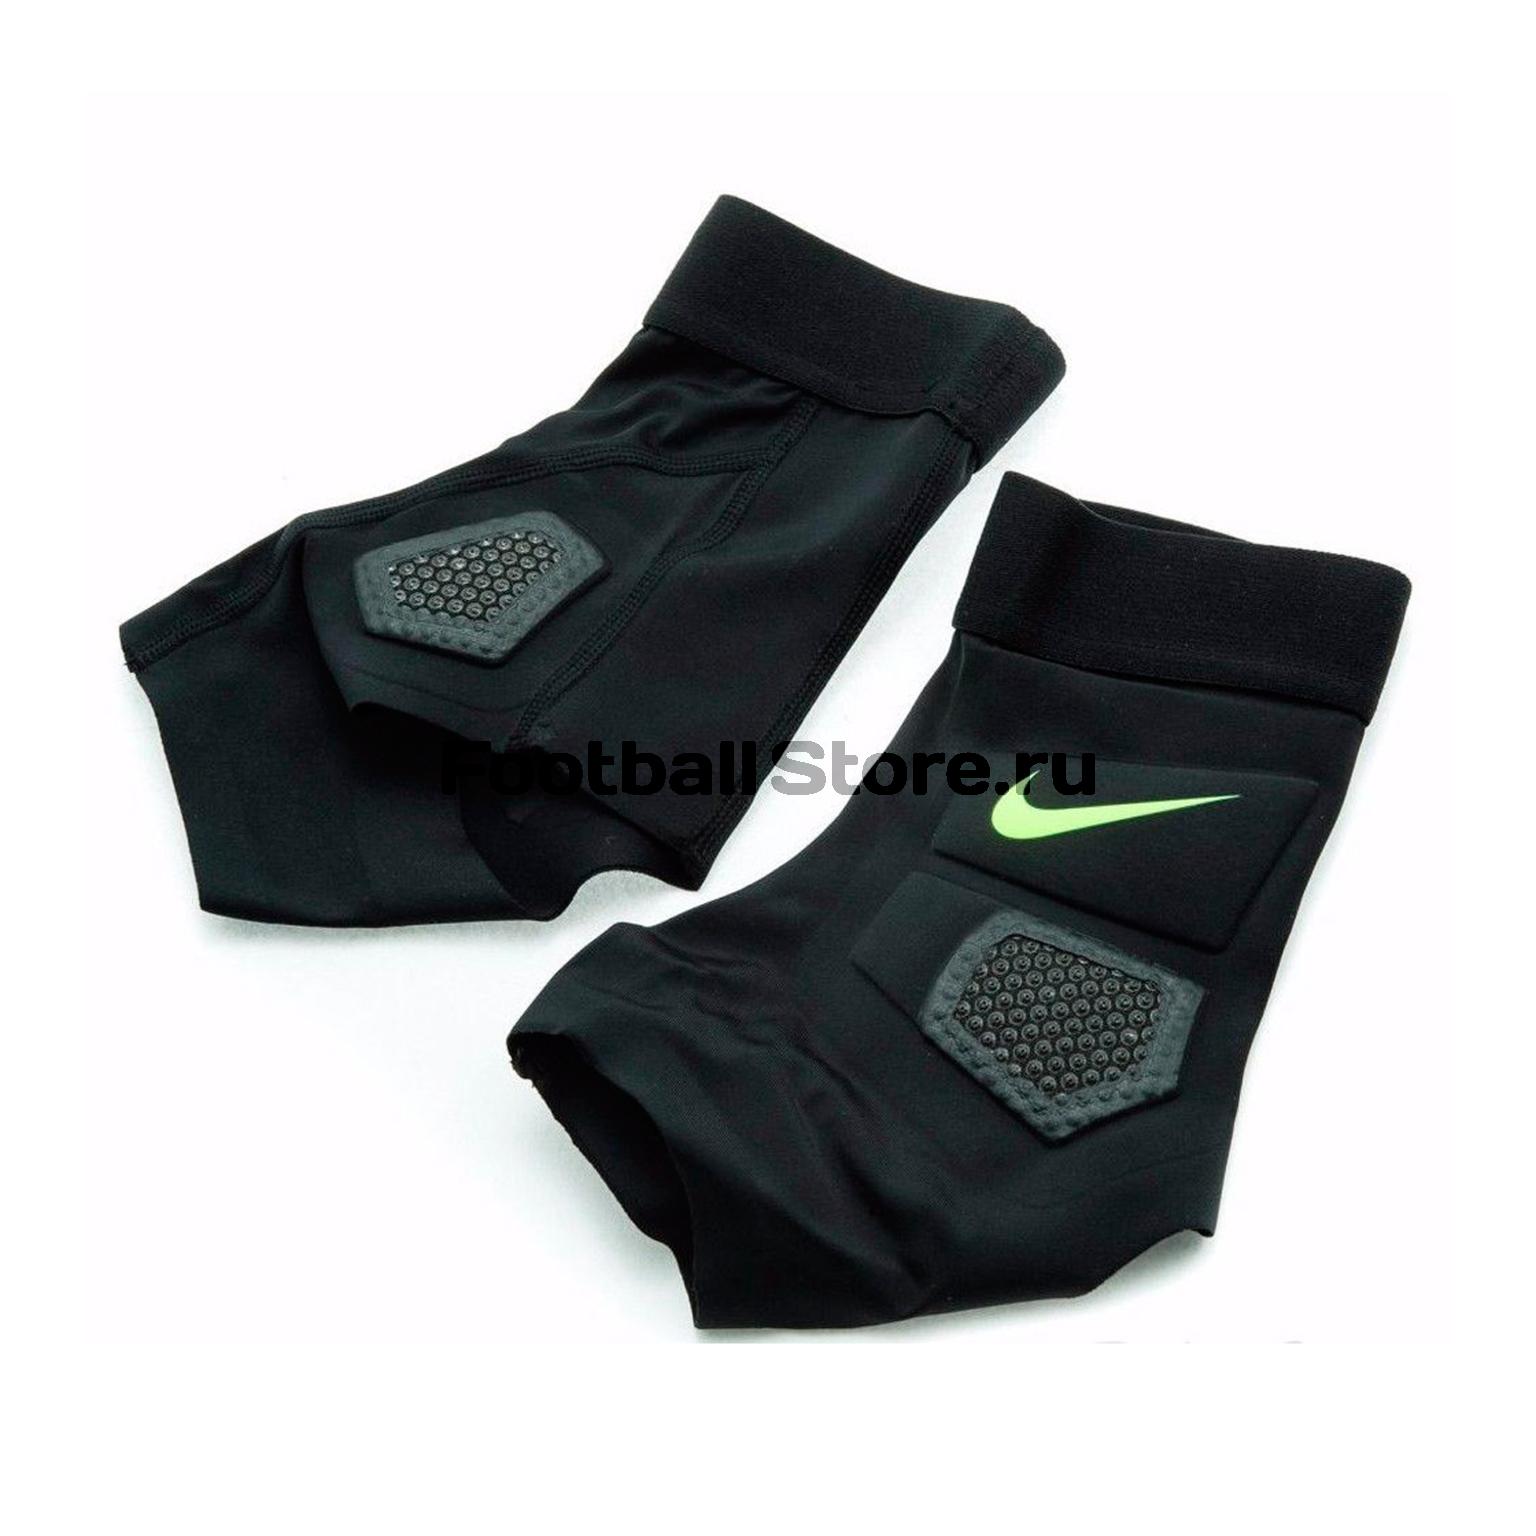 Медицина Nike Фиксатор для голеностопа Nike NK STRK ANKL SLV SE0176-010 медицина nike фиксатор для голеностопа nike nk strk ankl slv se0176 702